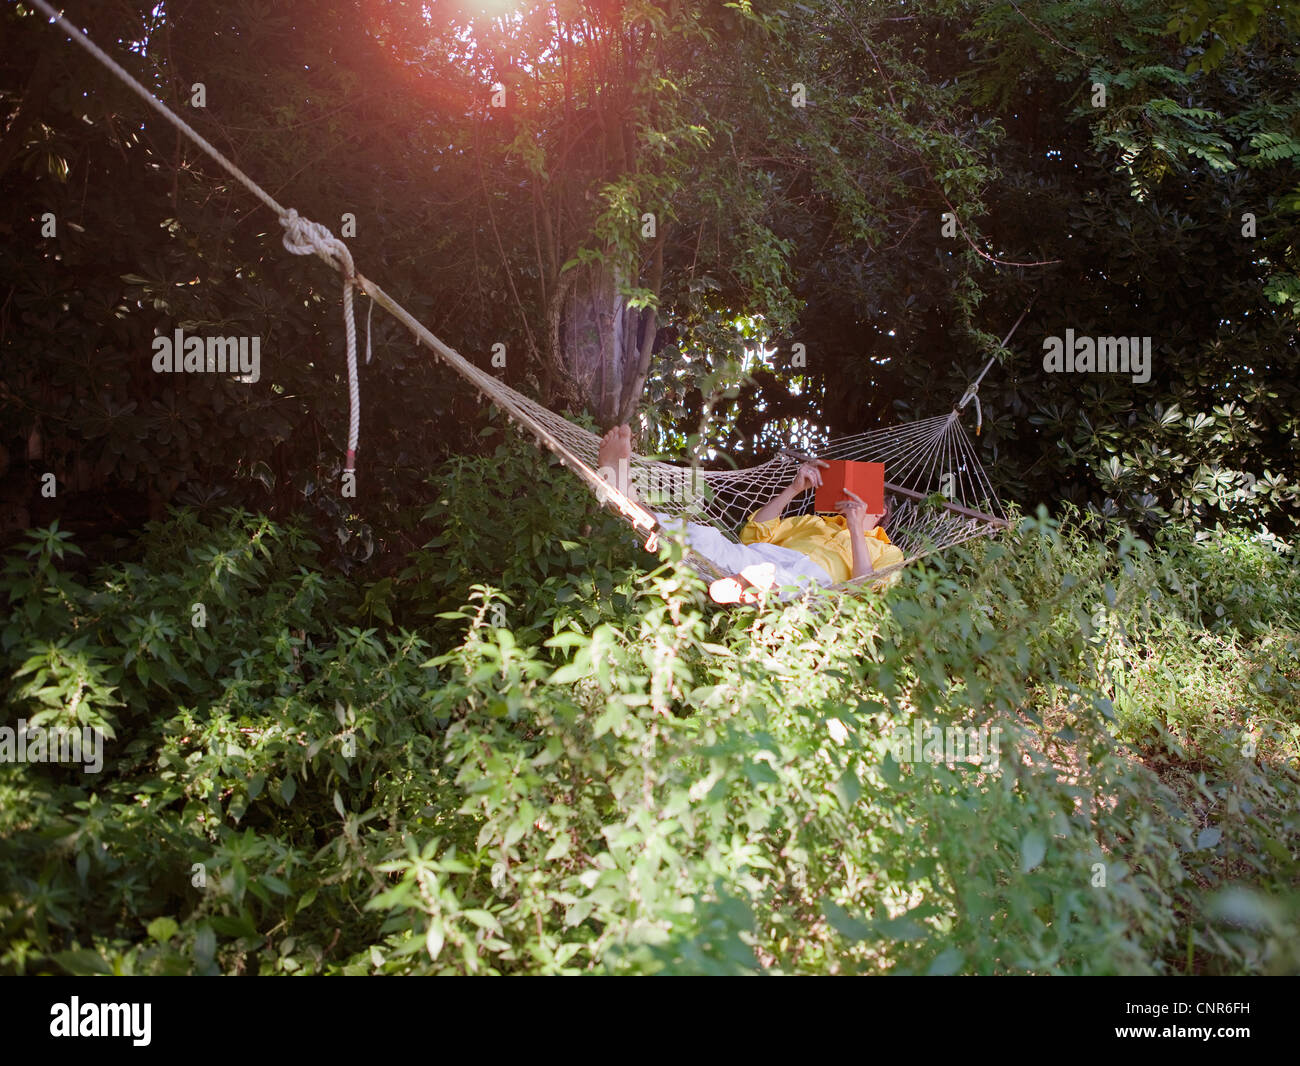 Man reading in hammock outdoors - Stock Image